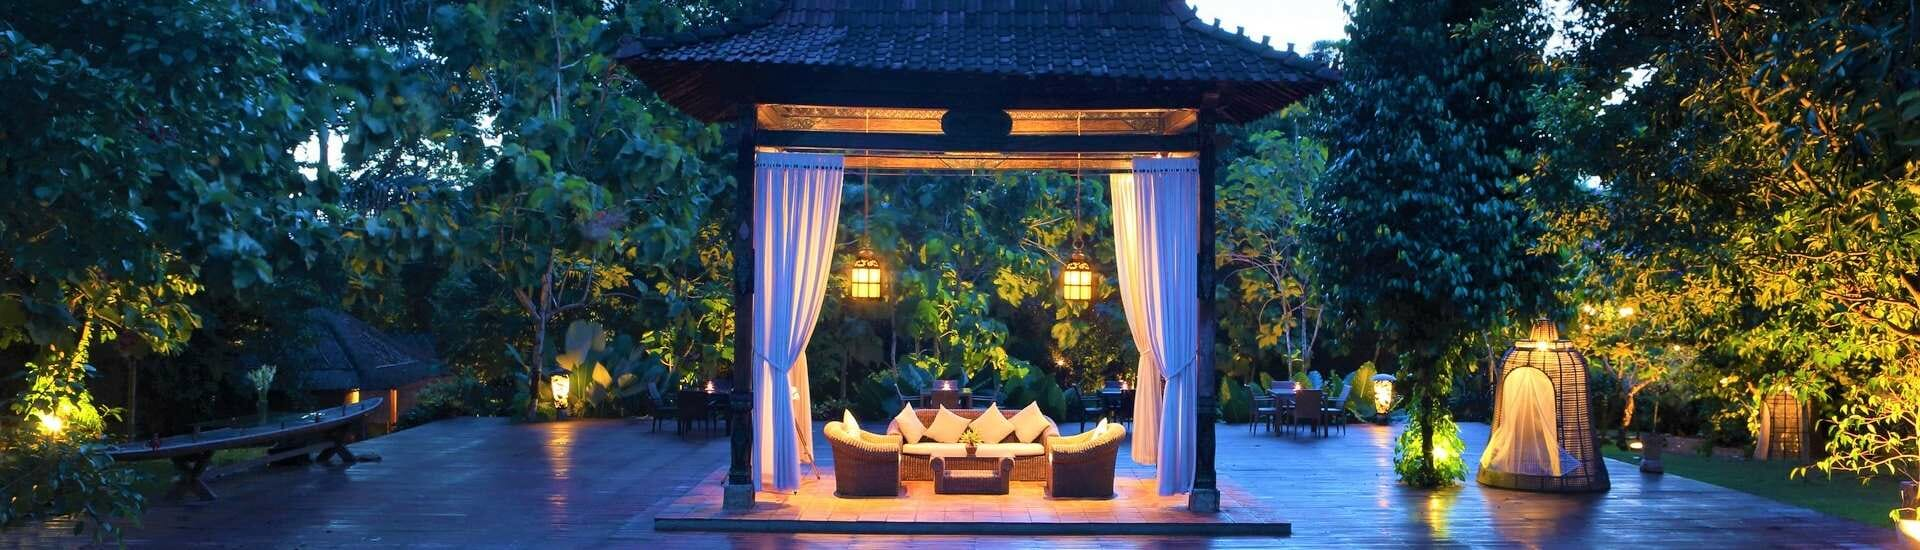 Plataran Canggu Resort & Spa Hero Image of the Aurora Open Deck